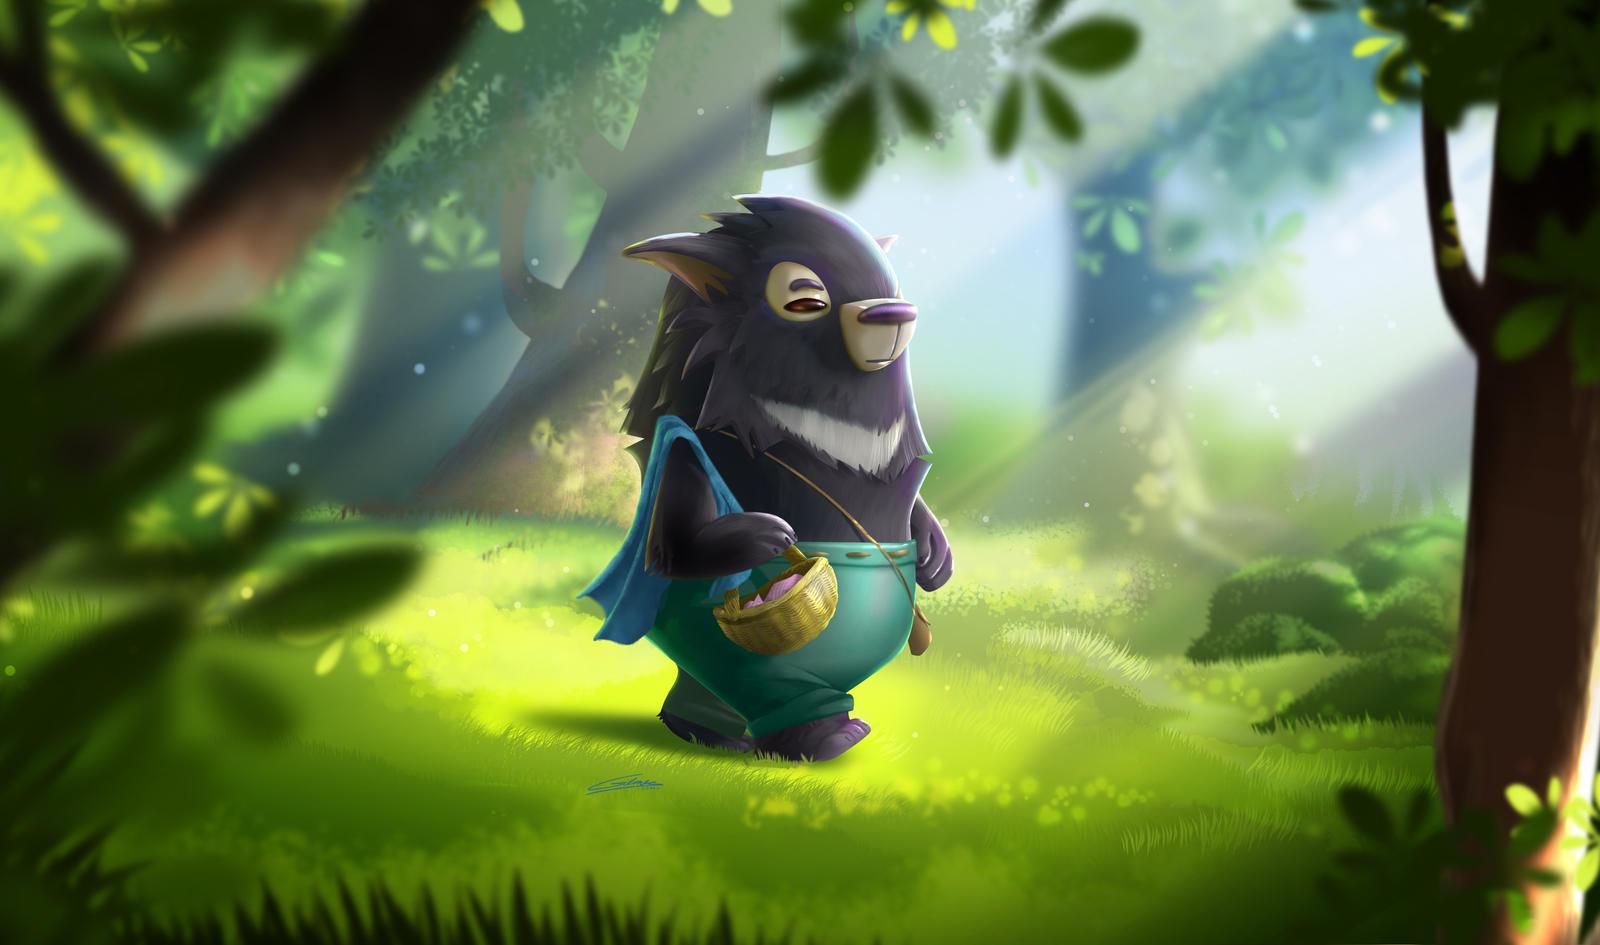 Moonbear walking by Gilmec